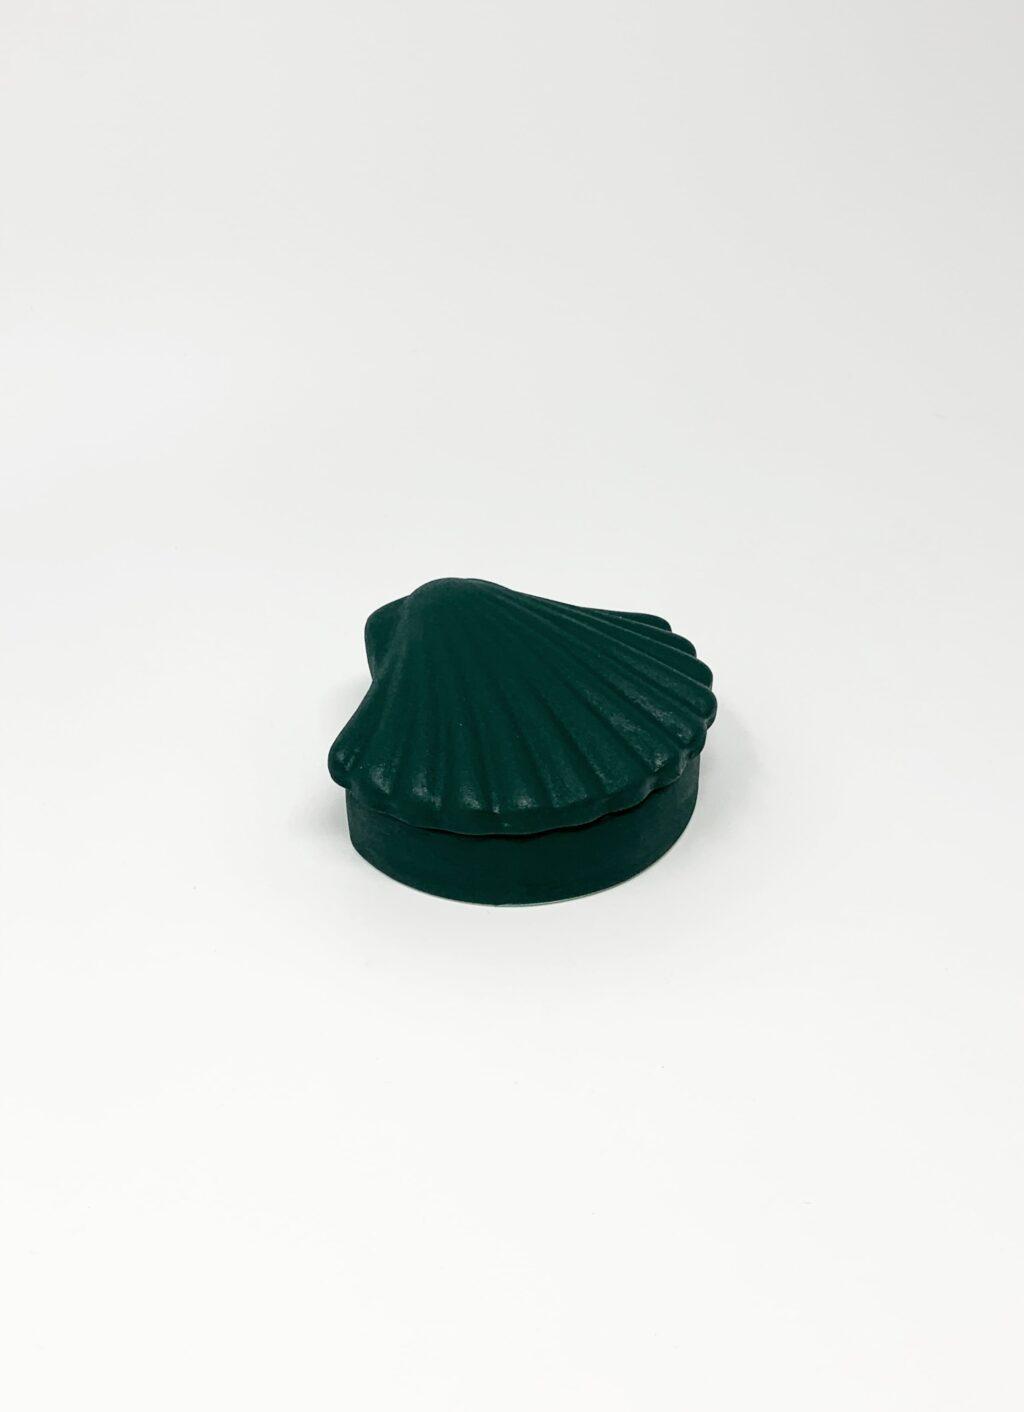 Los Objetos Decorativos - Seashell Box - Dark Green